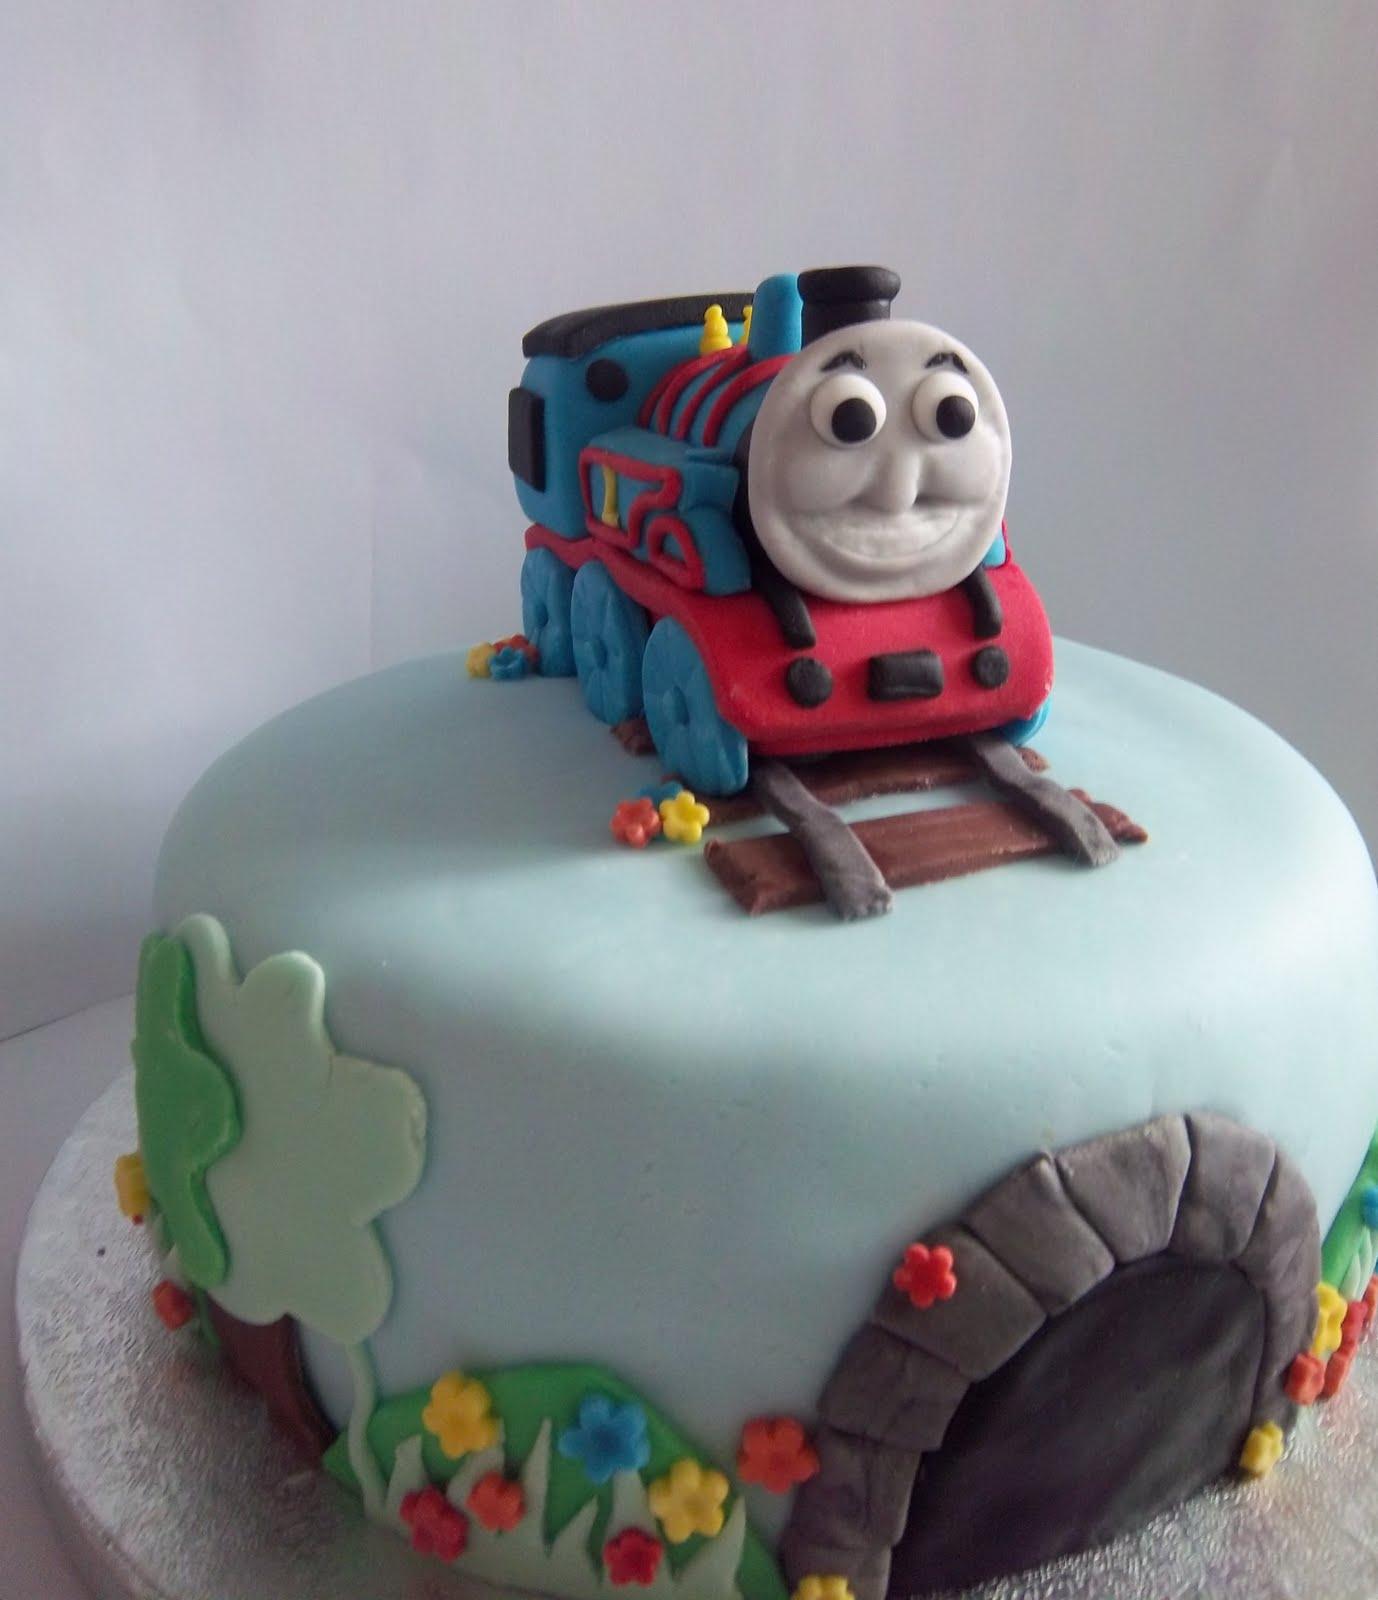 Bits N Bobs Thomas The Tank Engine 1st Birthday Cake